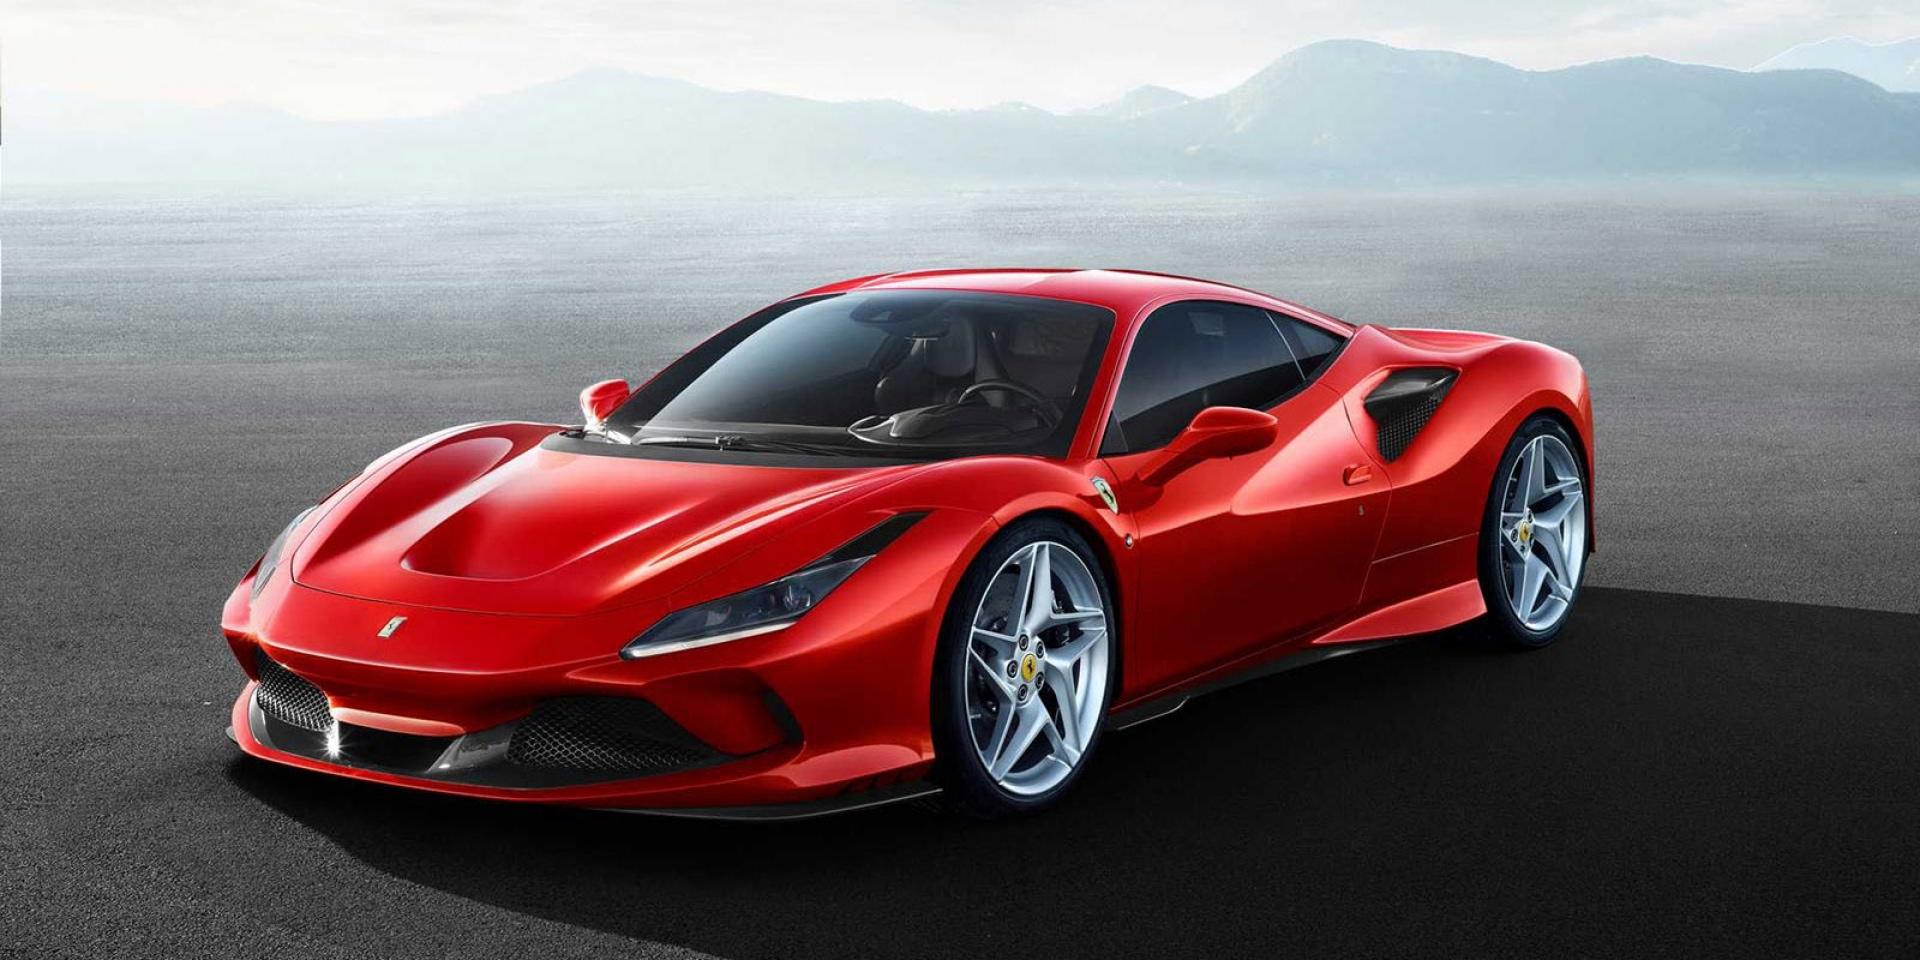 四圓尾燈回歸,Ferrari F8 Tributo定裝照發布